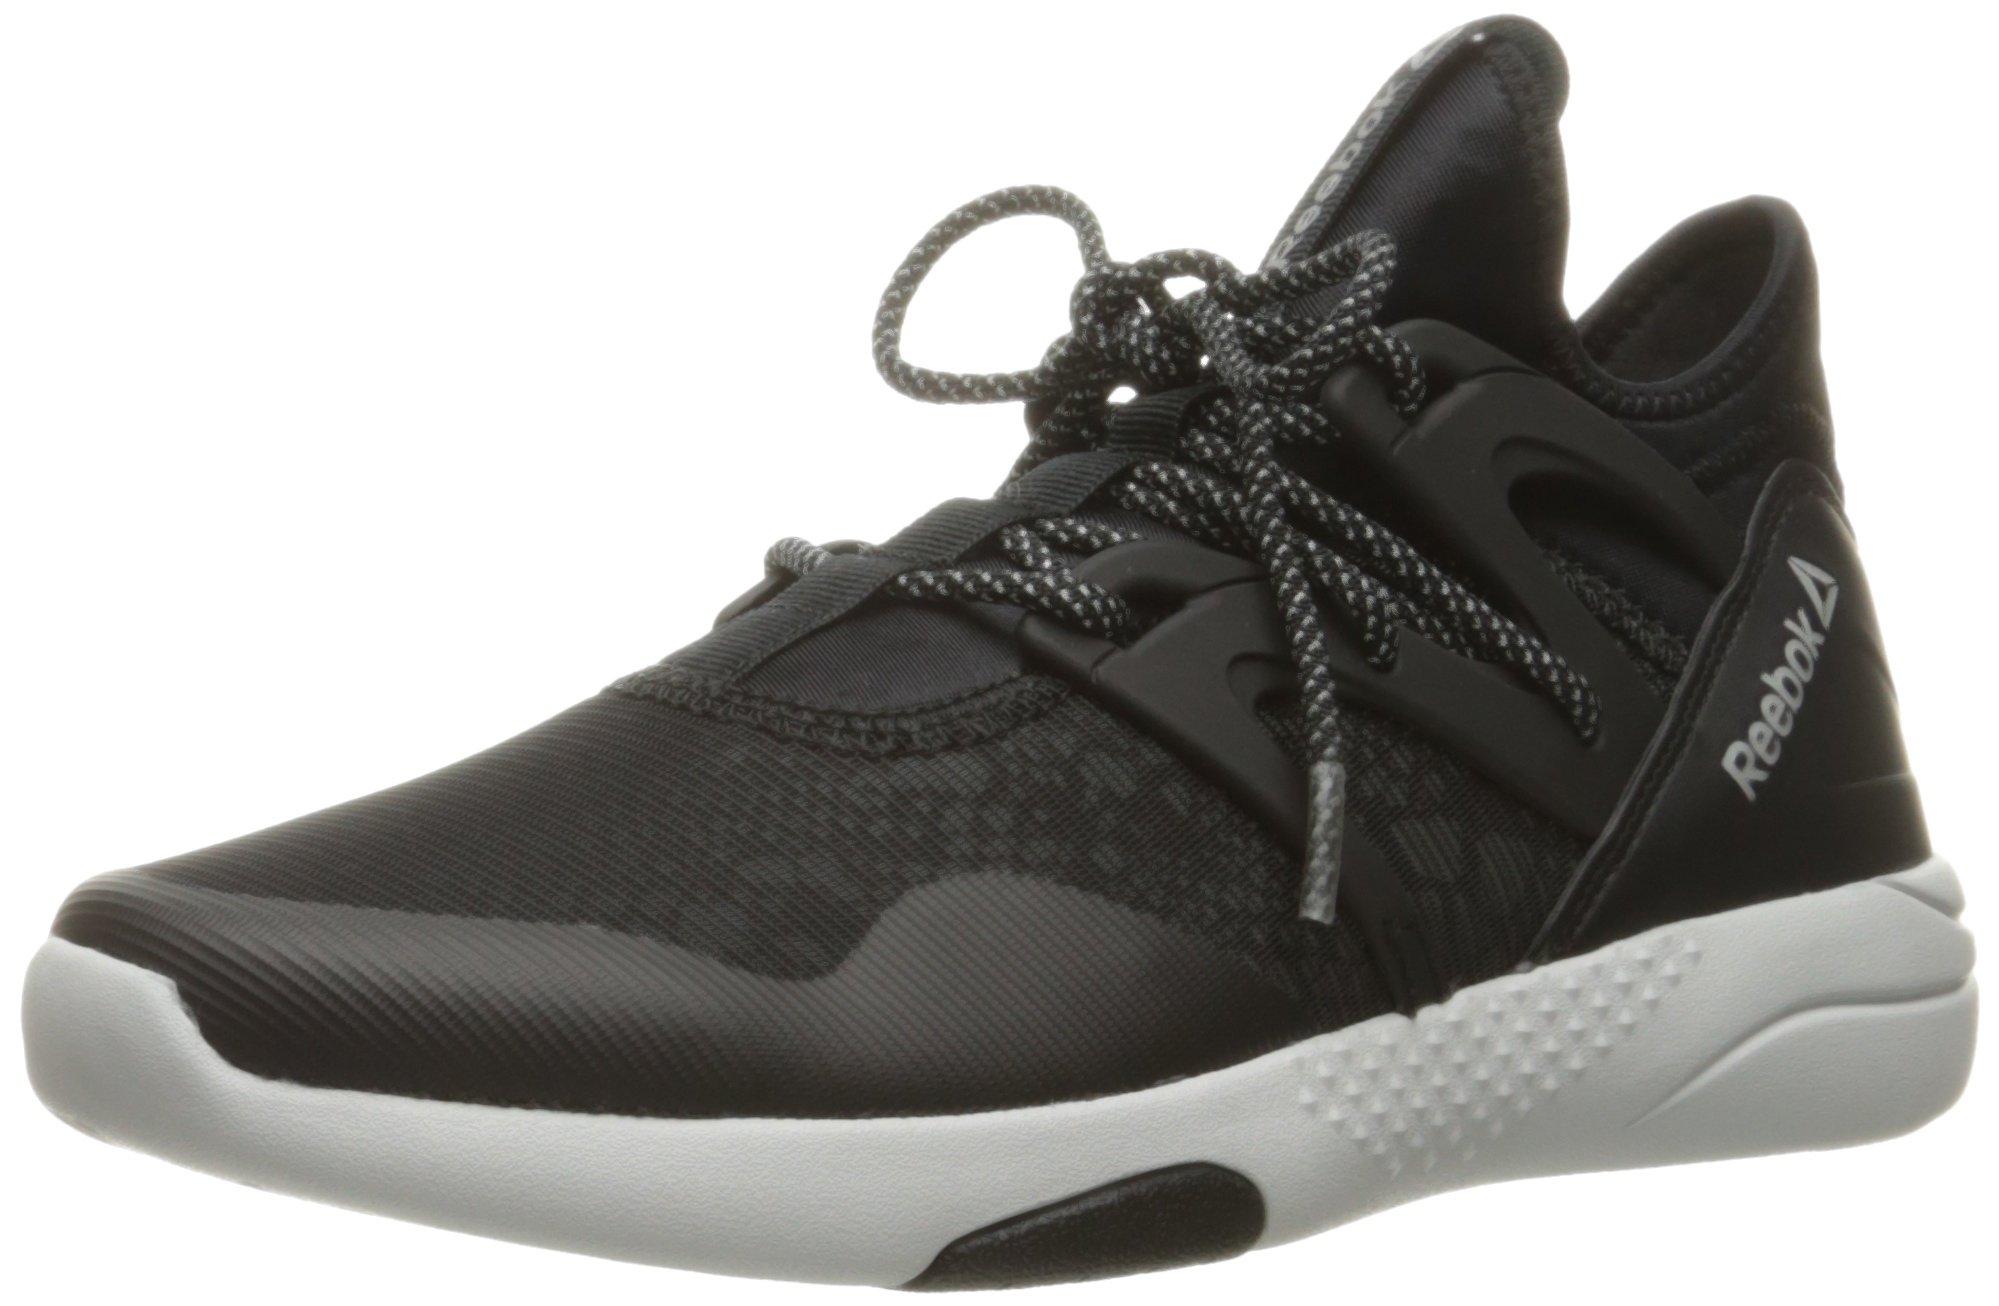 Reebok Women's Hayasu Cross-Trainer Shoe, Black/Skull Grey/Silver Reflective, 8 M US